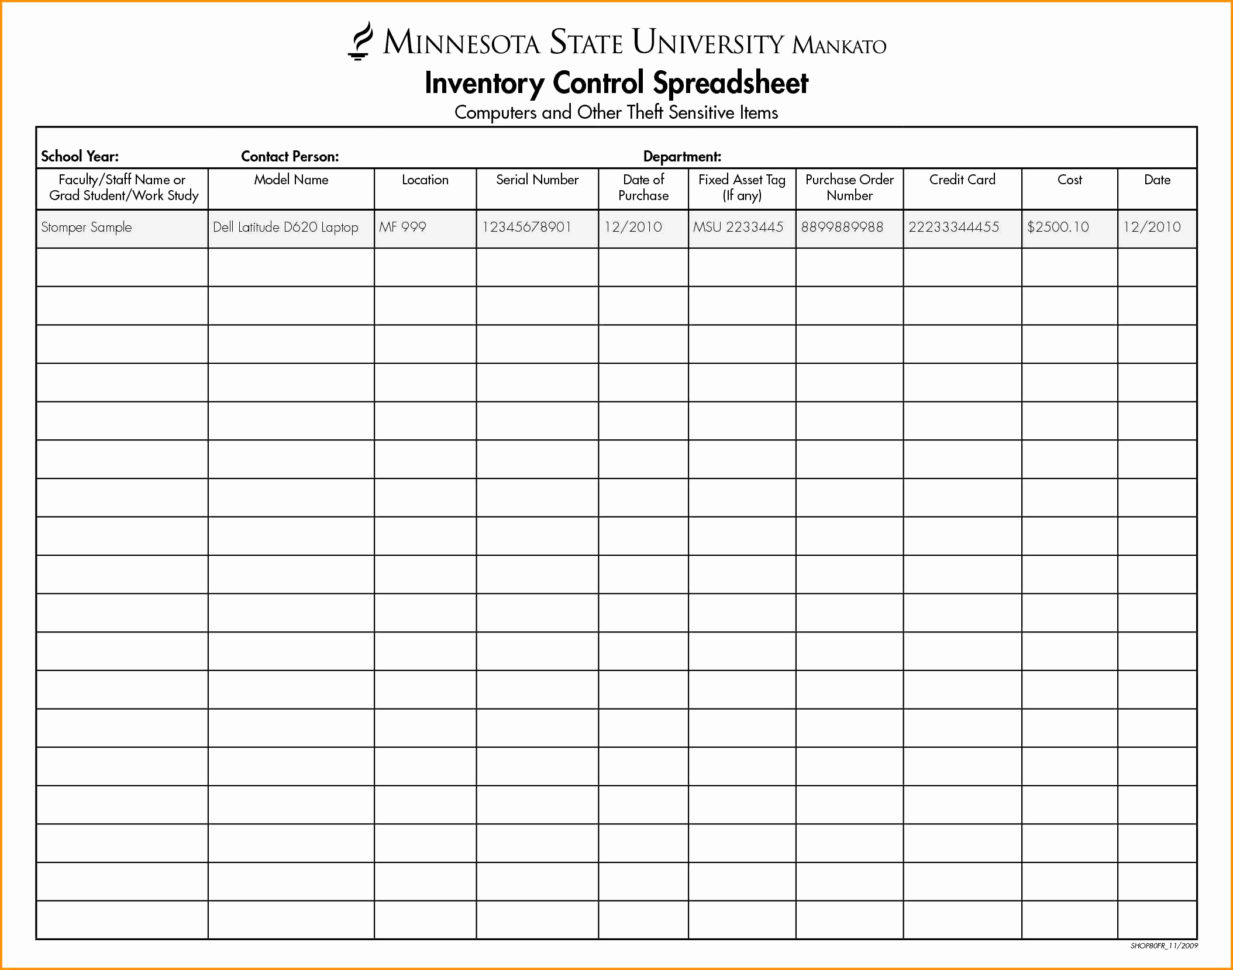 Cattle Inventory Spreadsheet Template Regarding Cattle